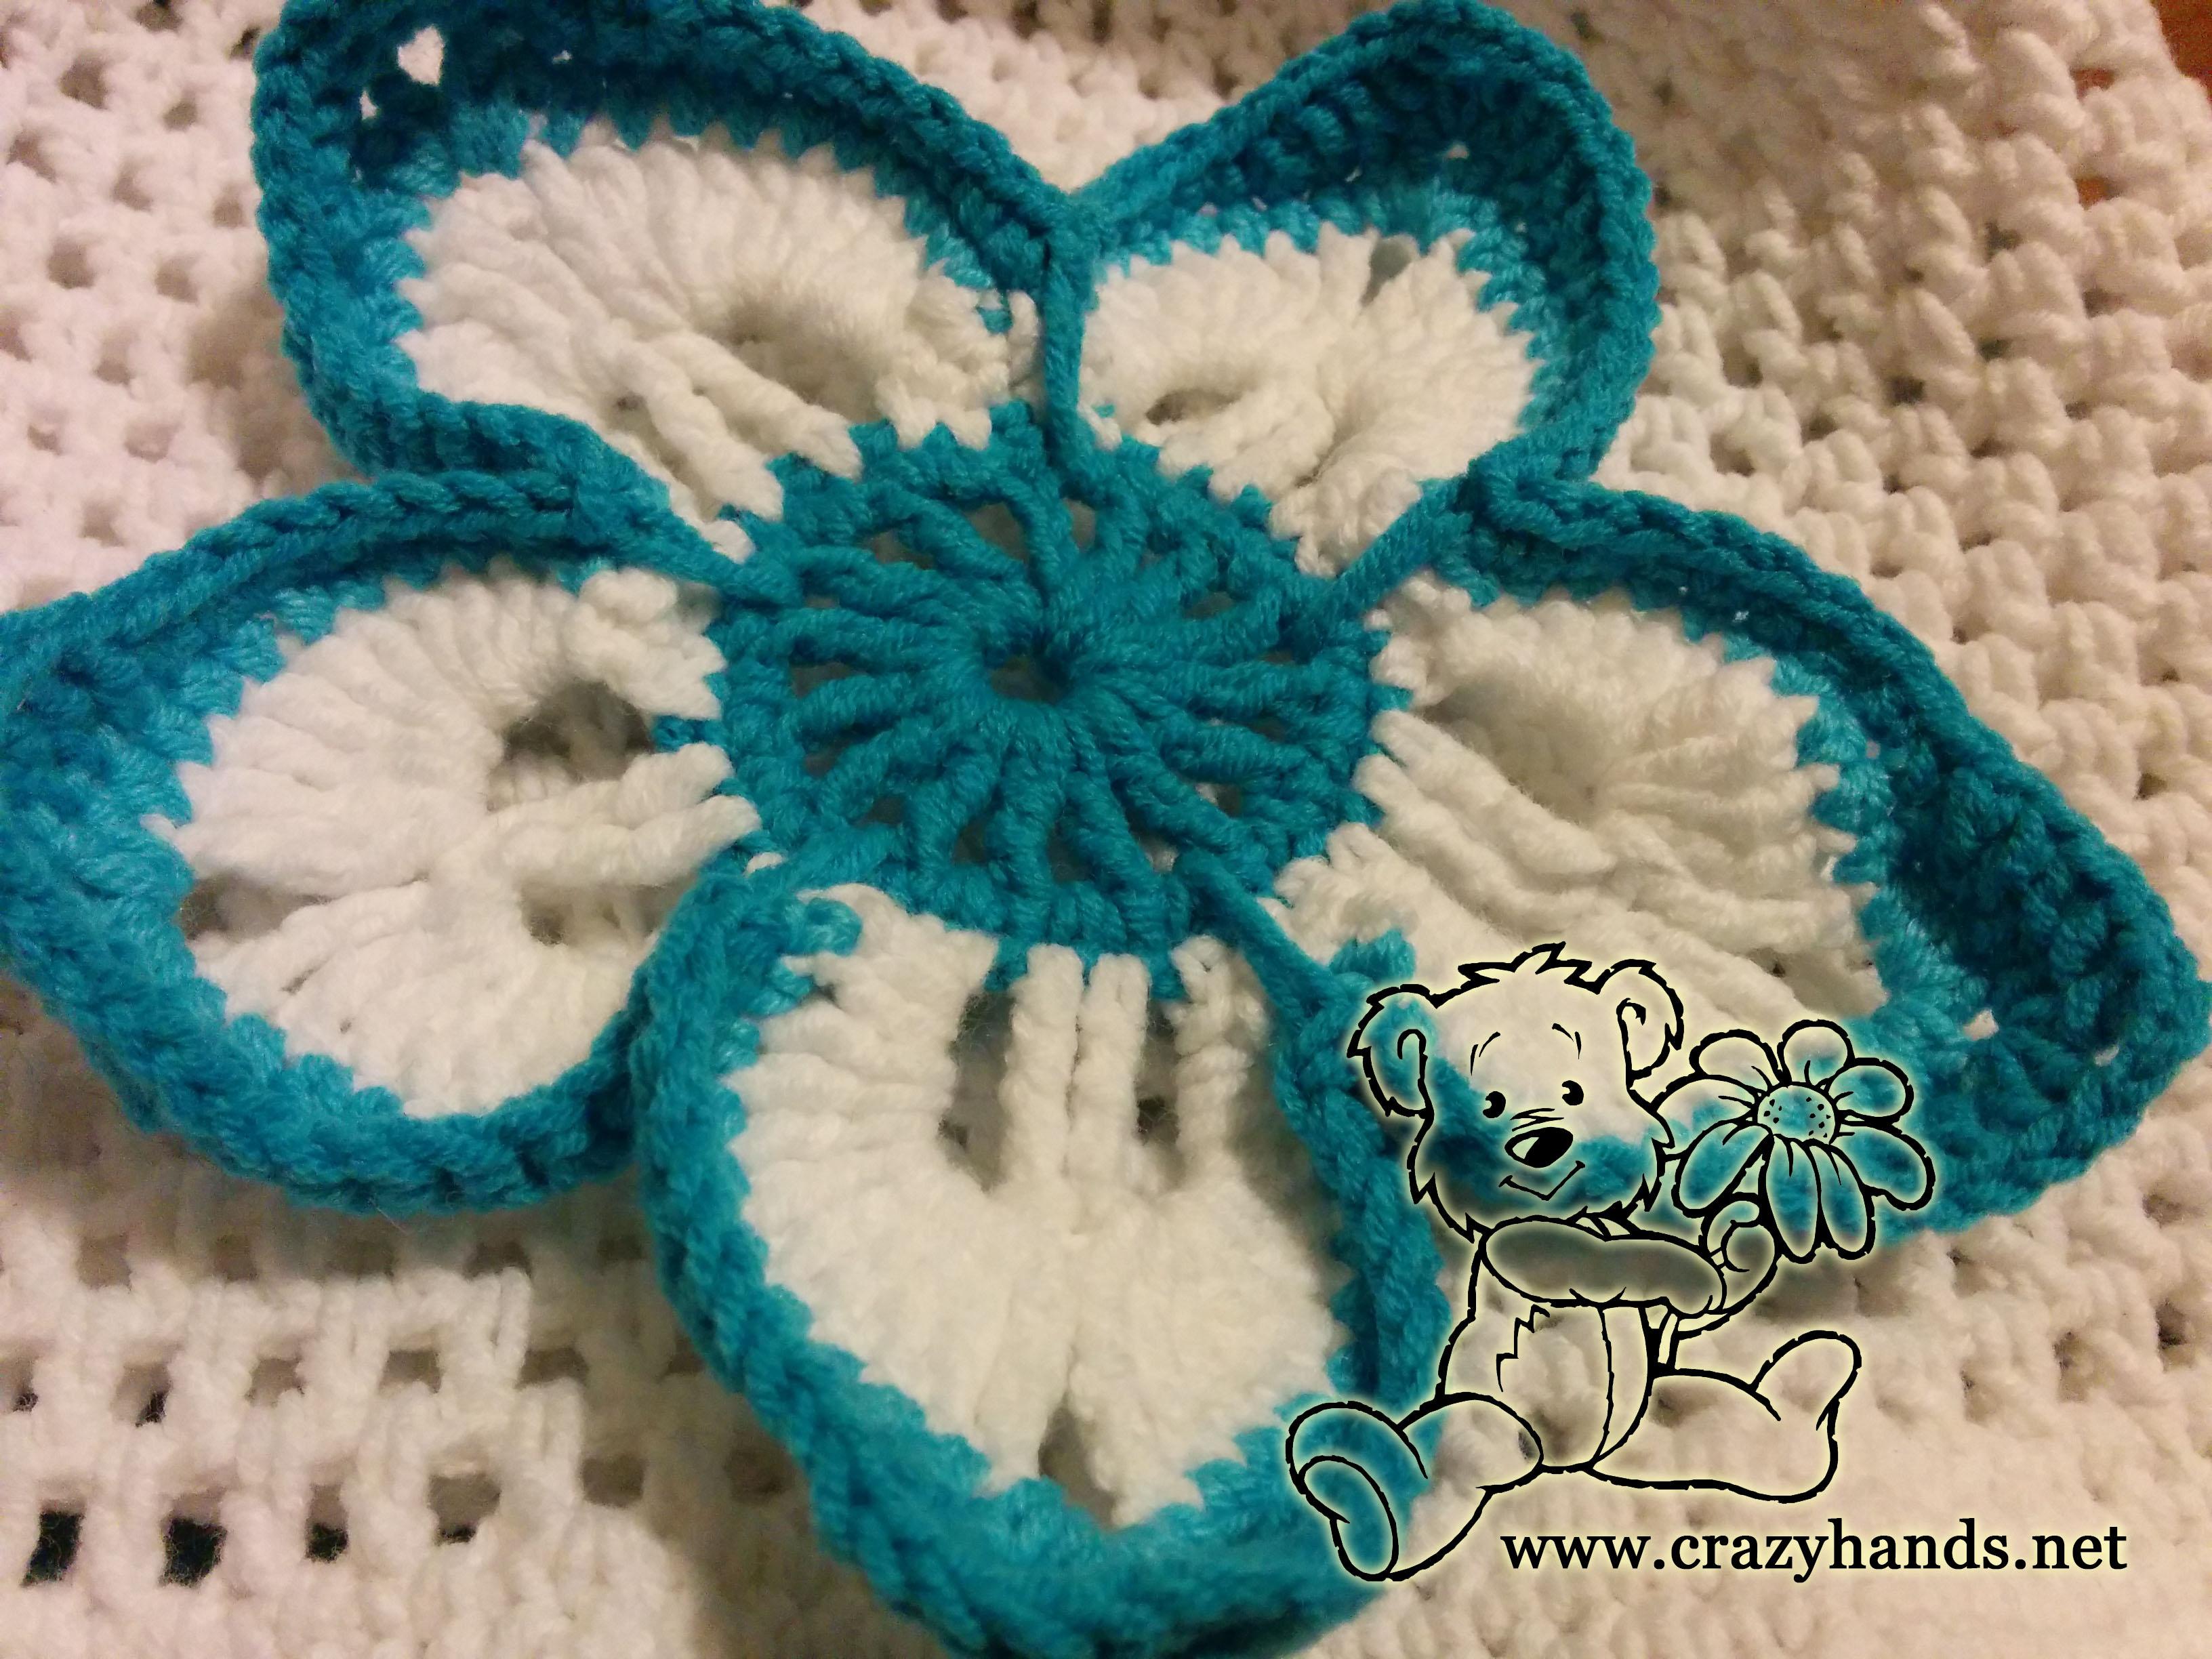 Crochet Flower Hat for Babies · Crazy Hands Knitting